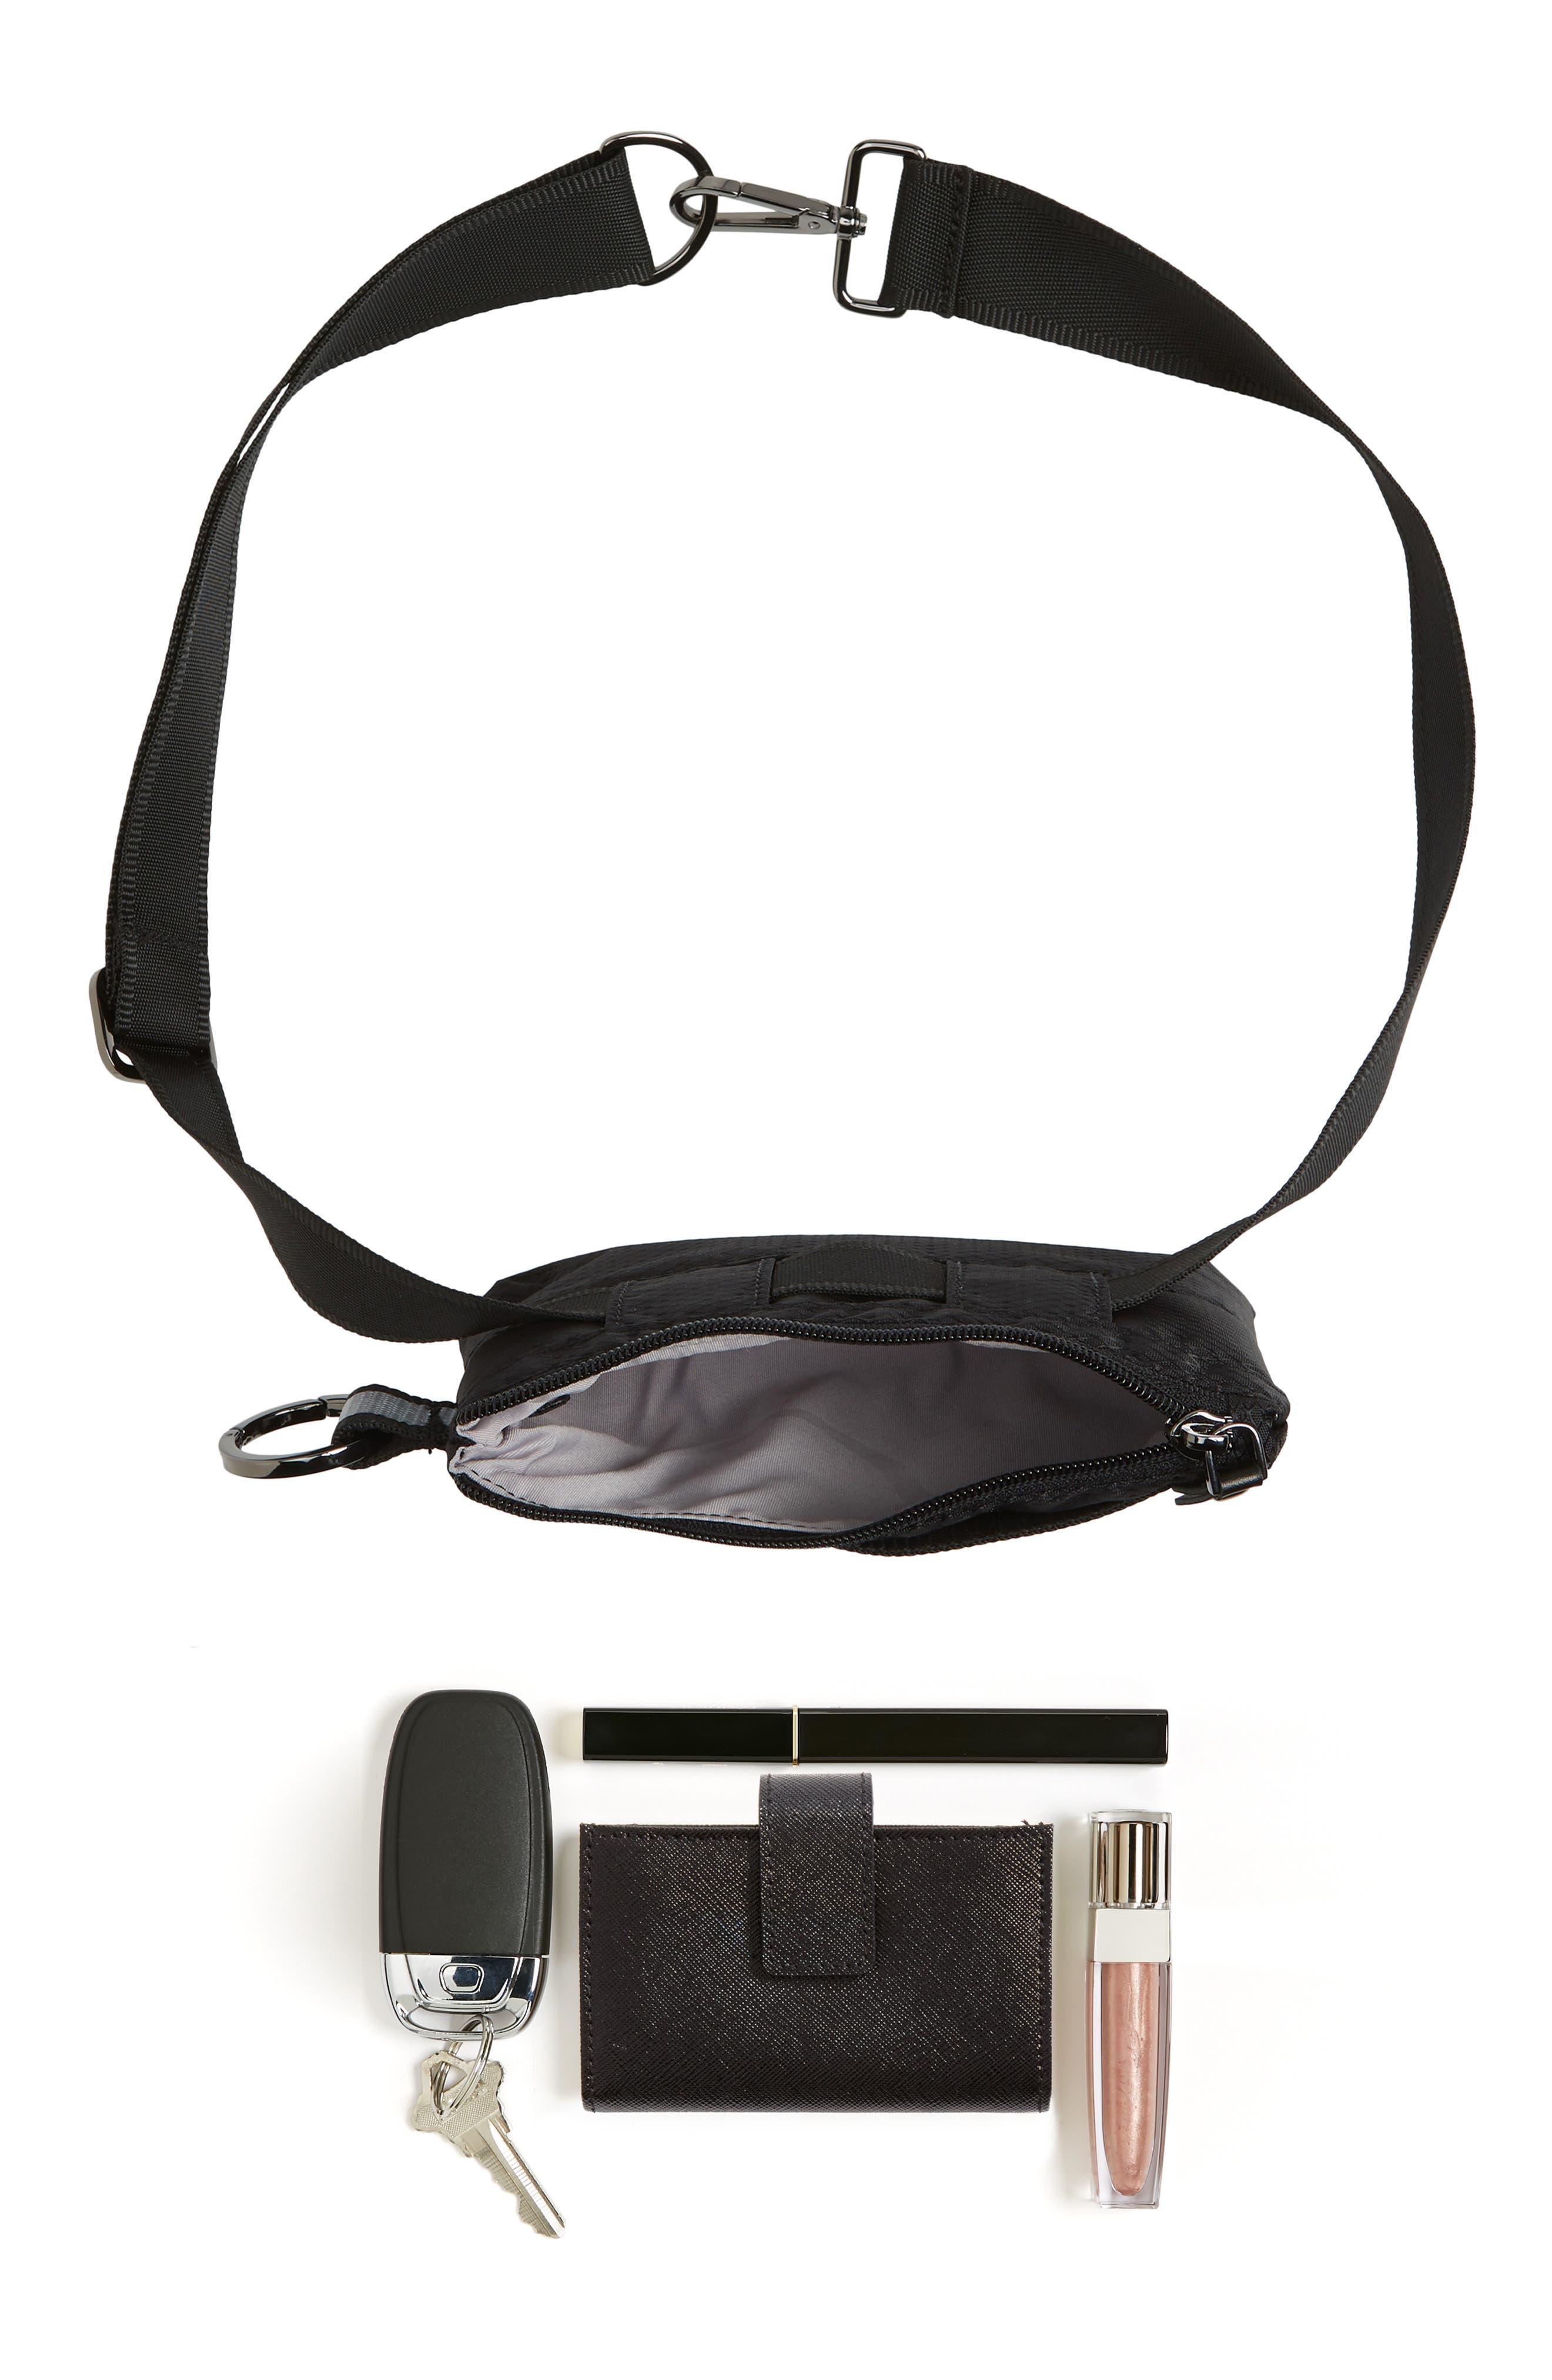 Urban Clutch Convertible Belt Bag,                             Alternate thumbnail 10, color,                             BLACK/ REFLECTIVE STRIPE